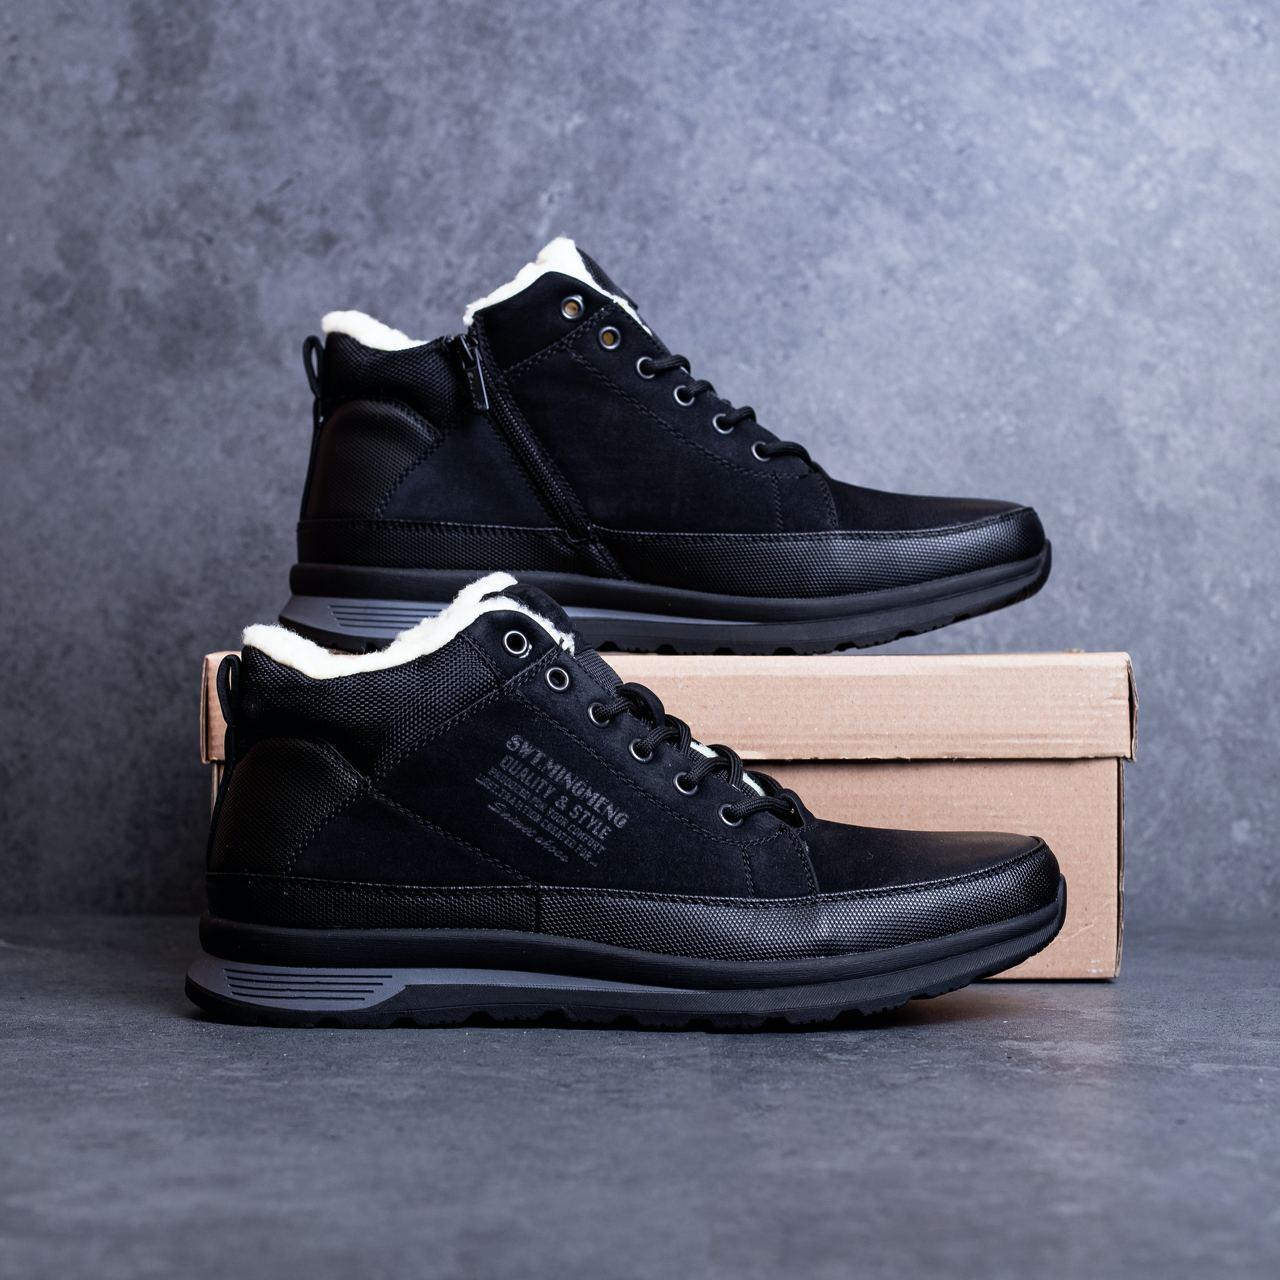 Мужские ботинки Ган Мен Pobedov (черные) 40